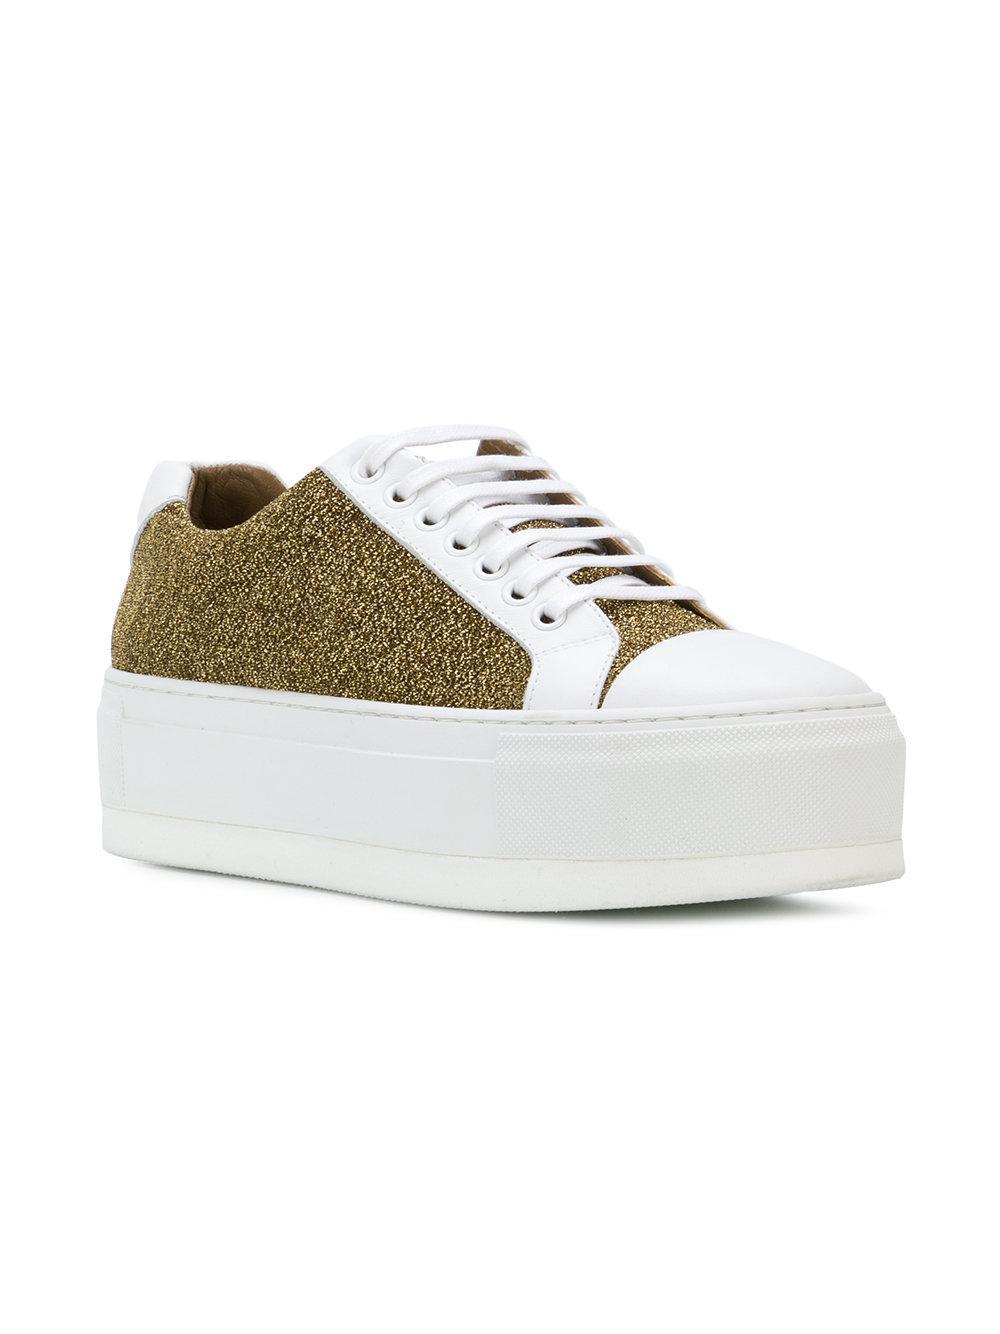 Sonia Rykiel Cotton Lurex Sneakers in Metallic